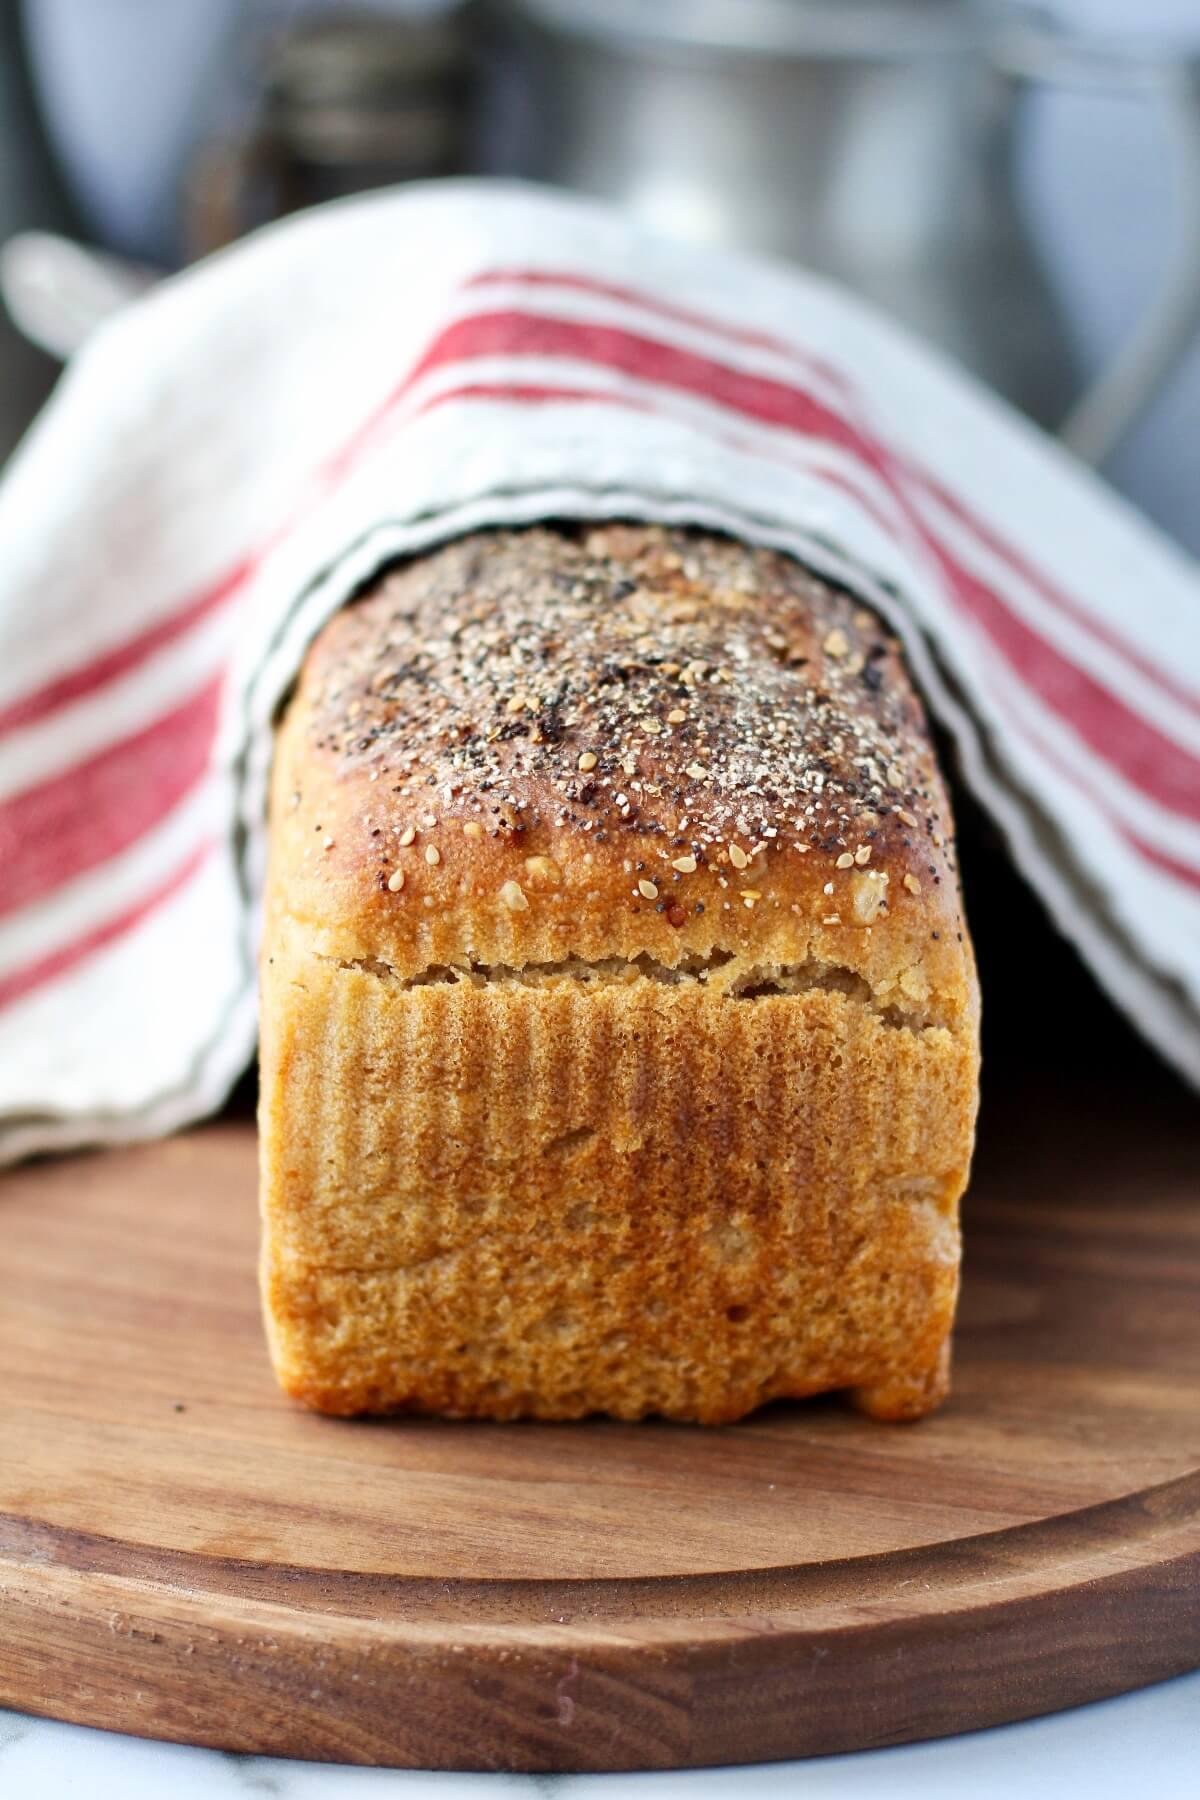 No Knead Sourdough Sandwich Bread with whole wheat.